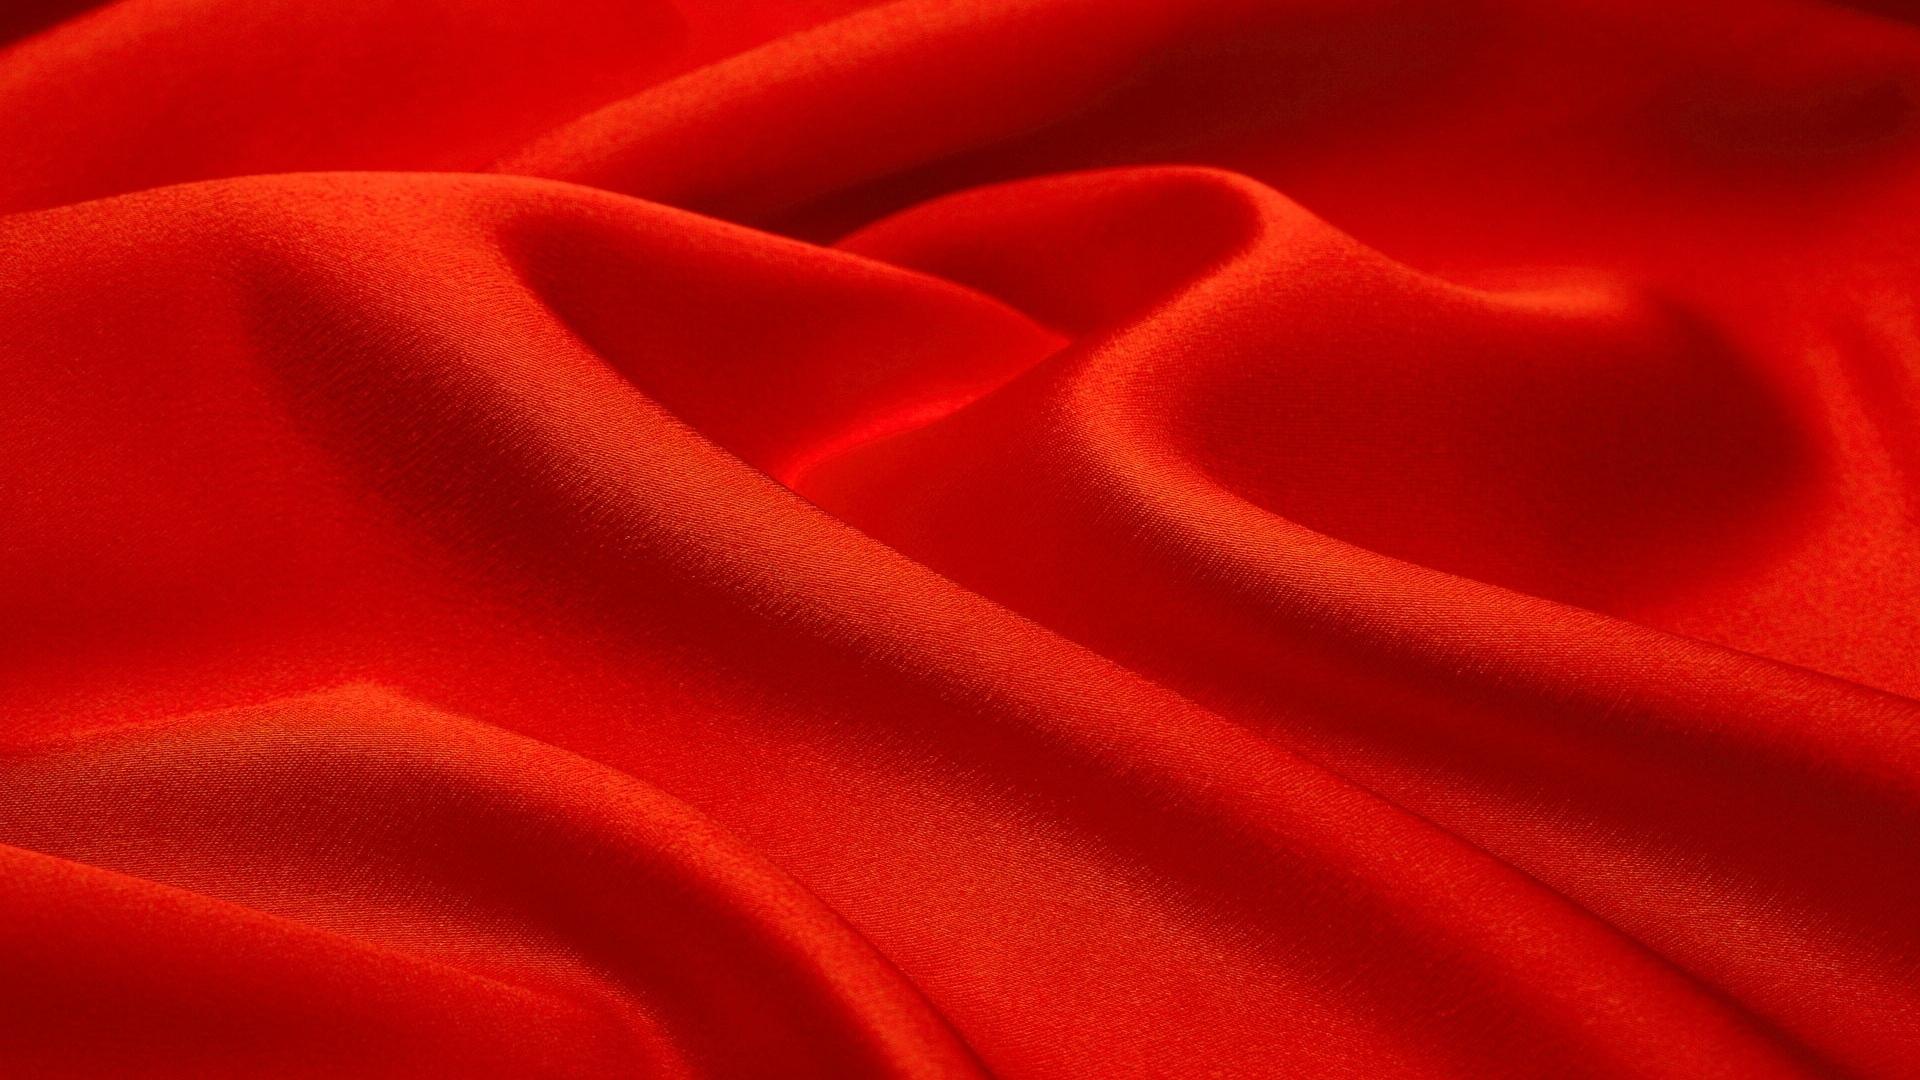 Plain Black Iphone Wallpaper Cloth Wallpapers Hd Pixelstalk Net